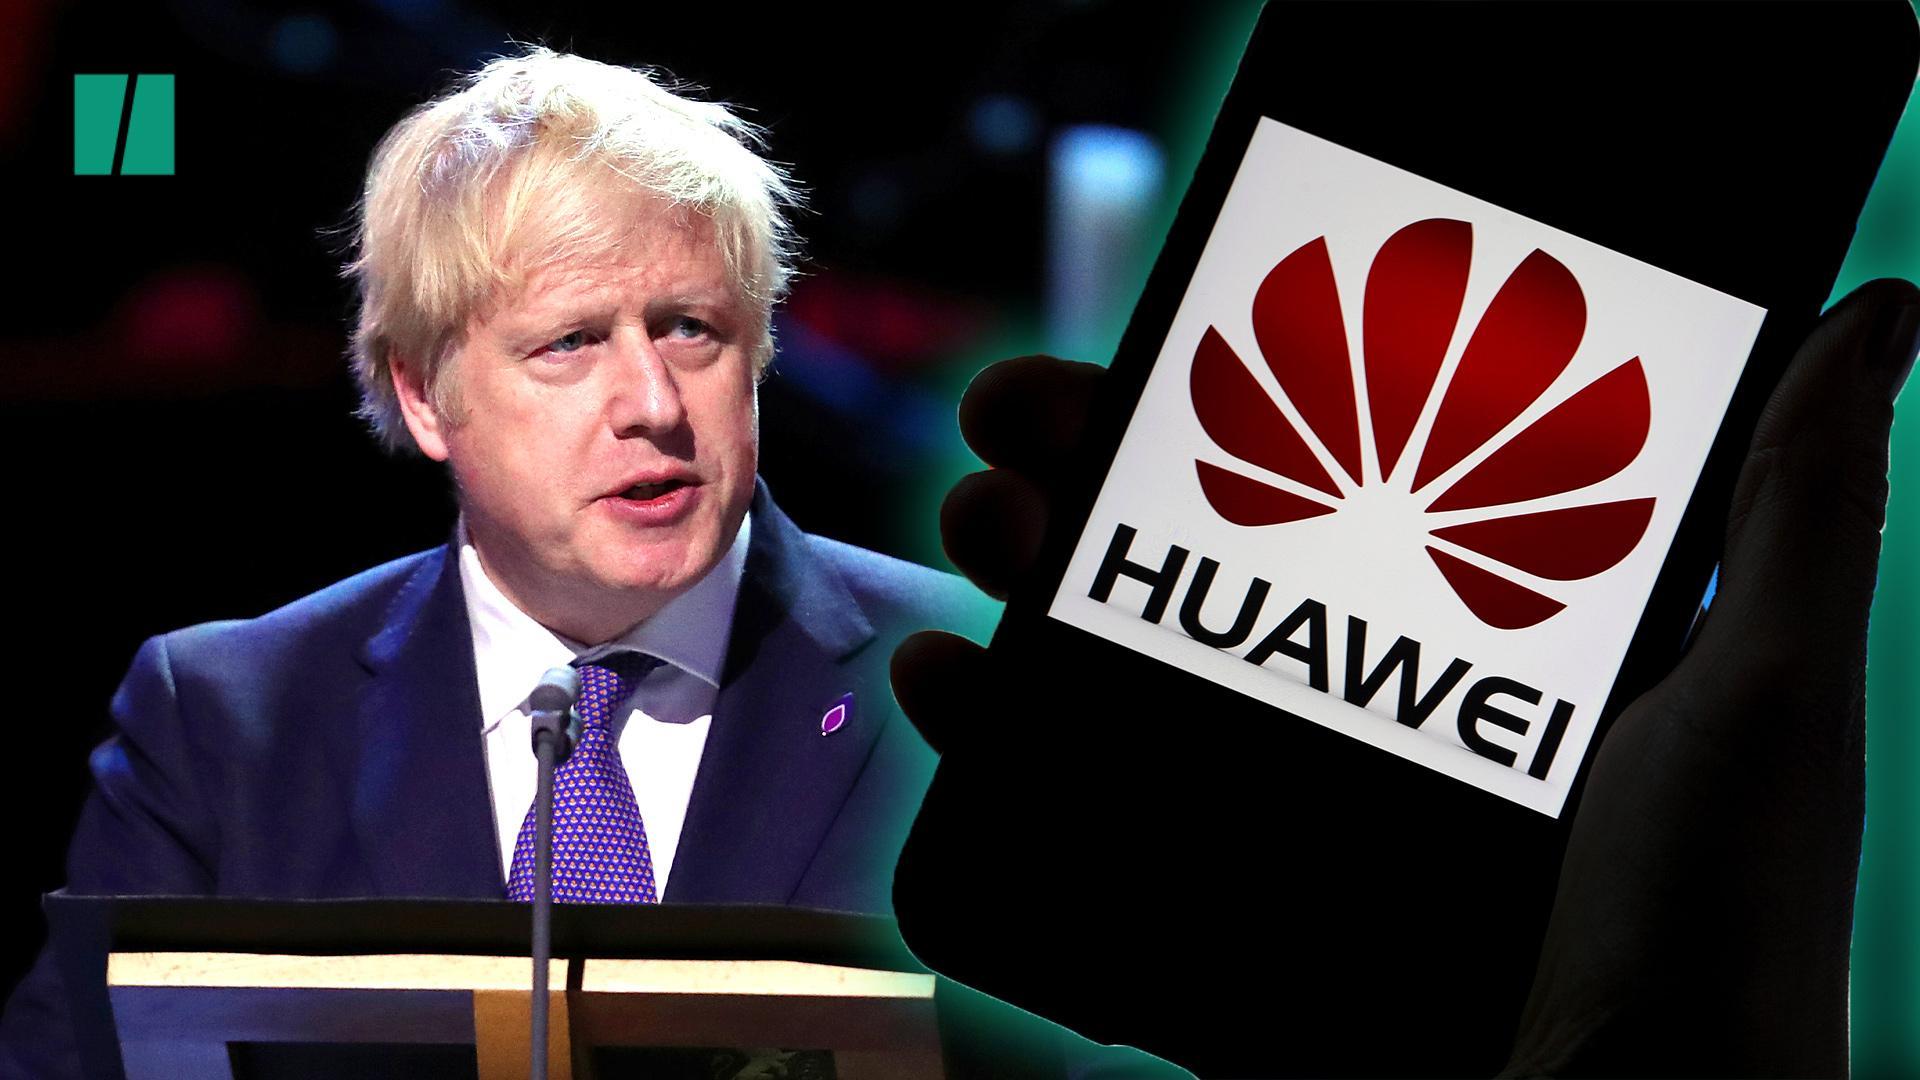 Boris Johnson Approves Huawei 5G Plan